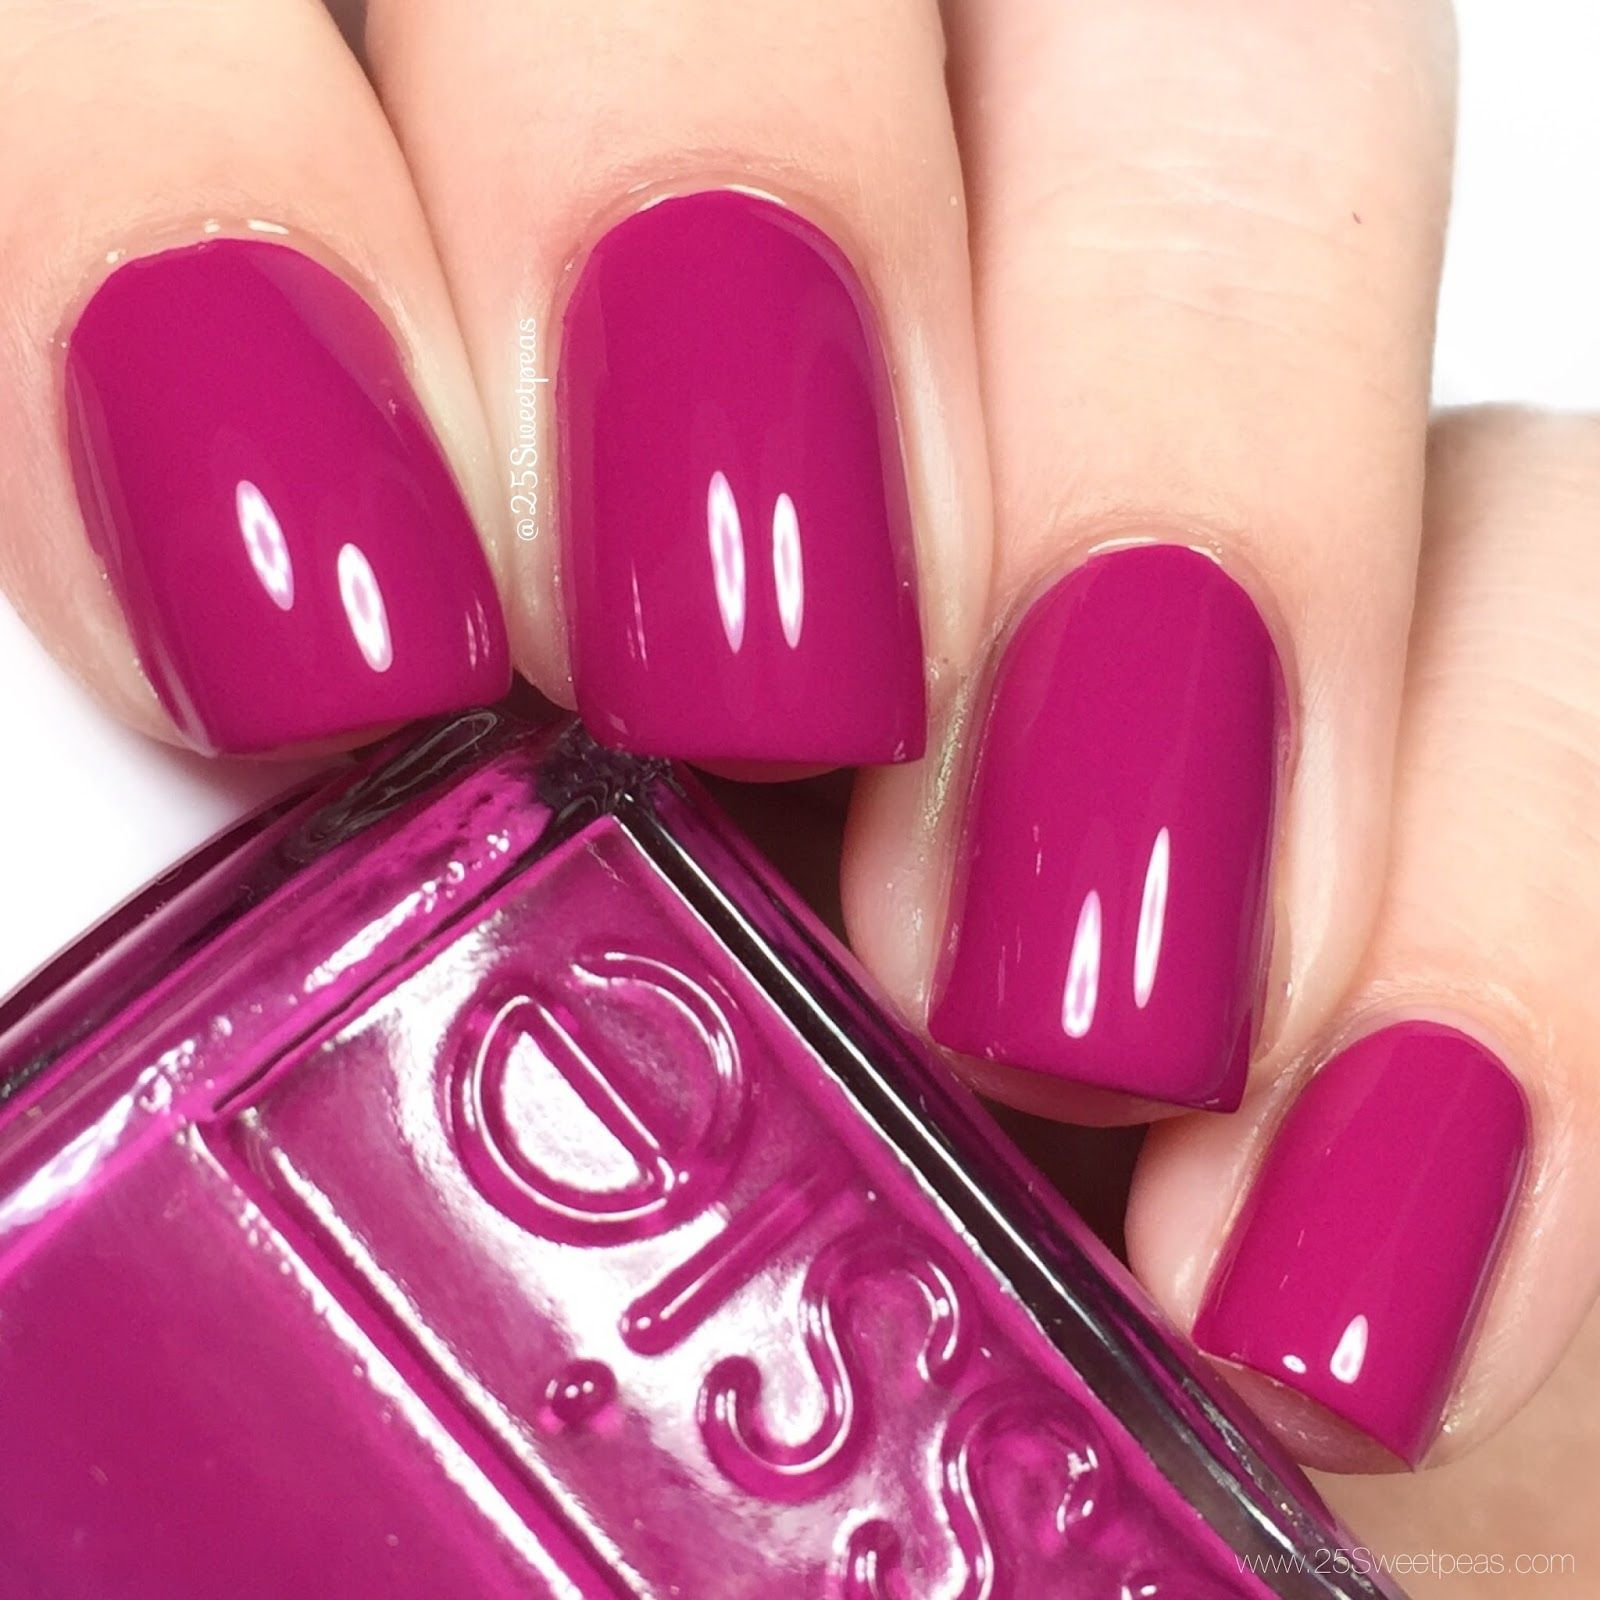 Essie Big Spender Nail Polish Essie Nail Polish Nails